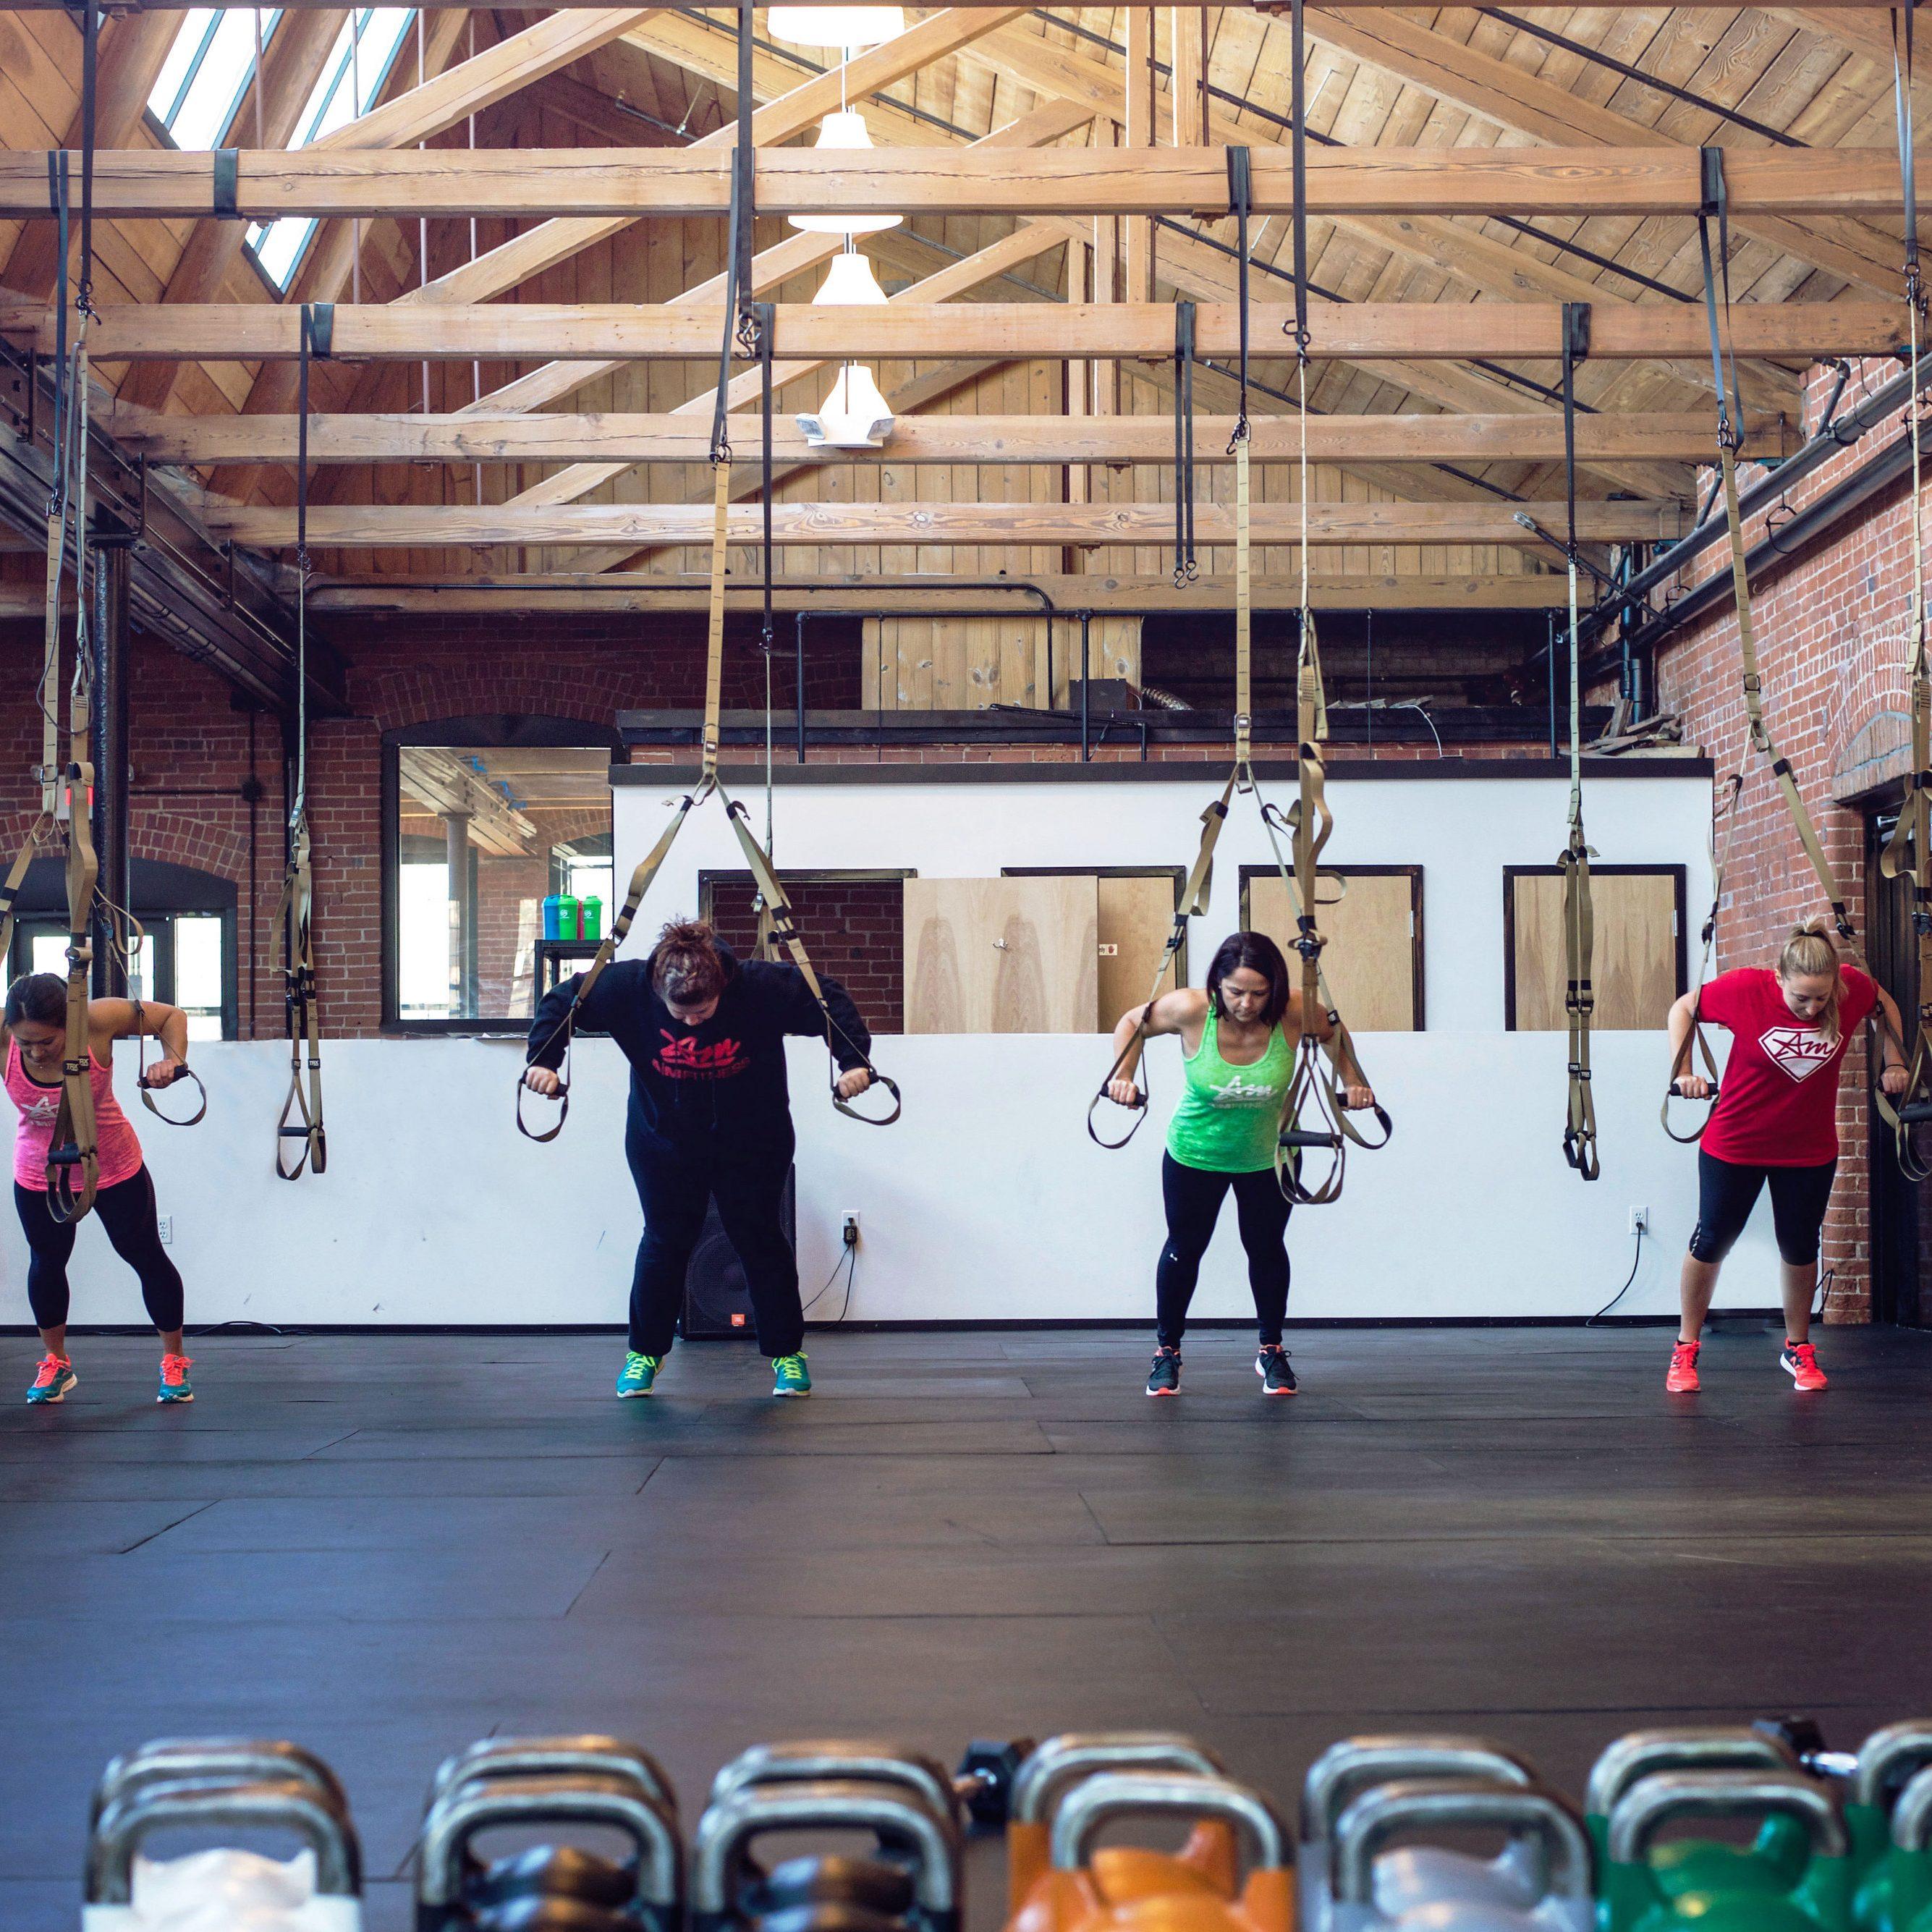 View More: https://zacharyandelizabethphotos.pass.us/am-fitness